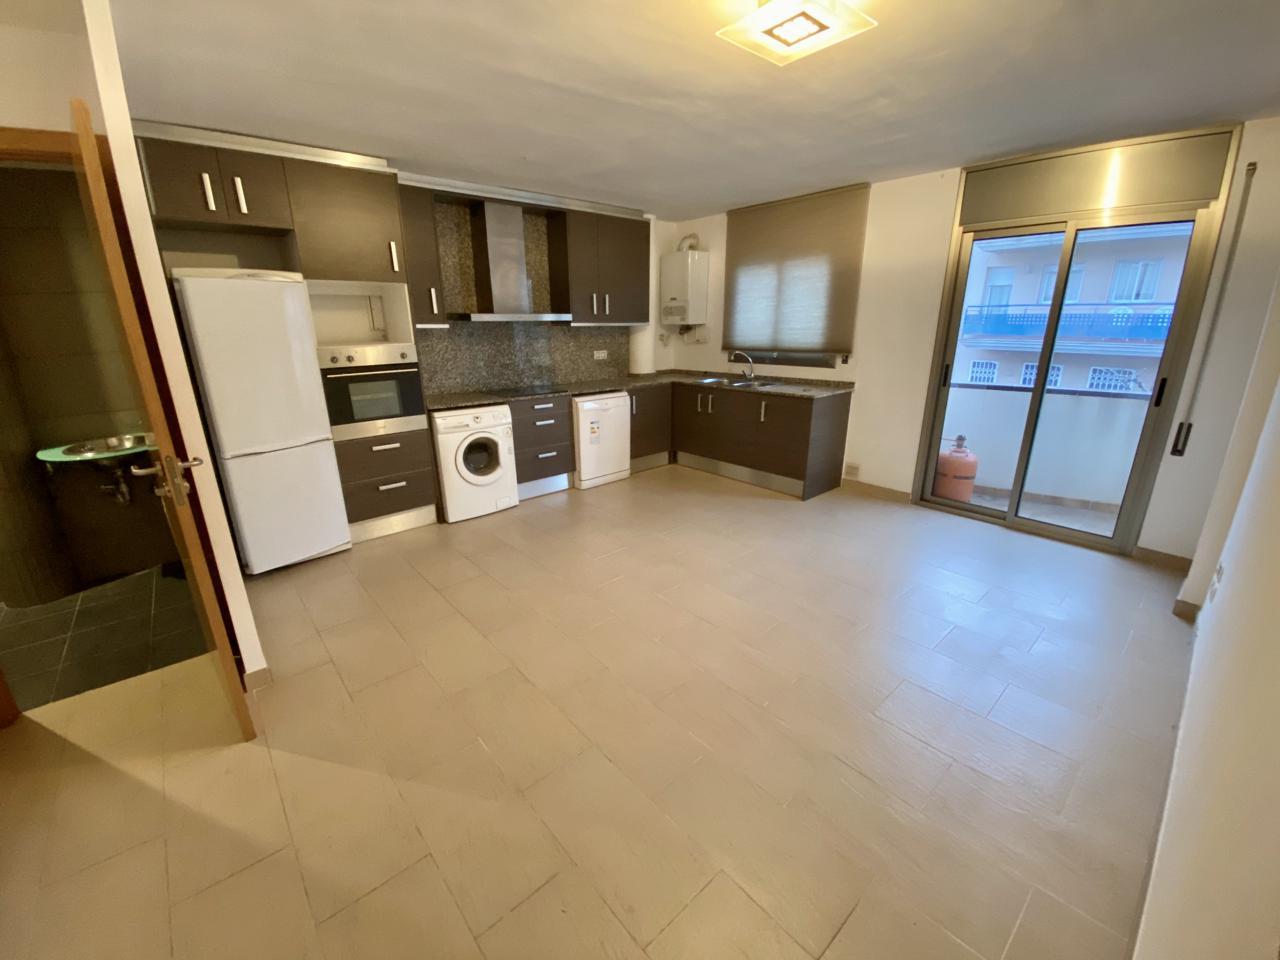 Pis  Avenida d'enric benet. Bonito piso en venta en avinguda d'enric benet, 43814, vila-rodo